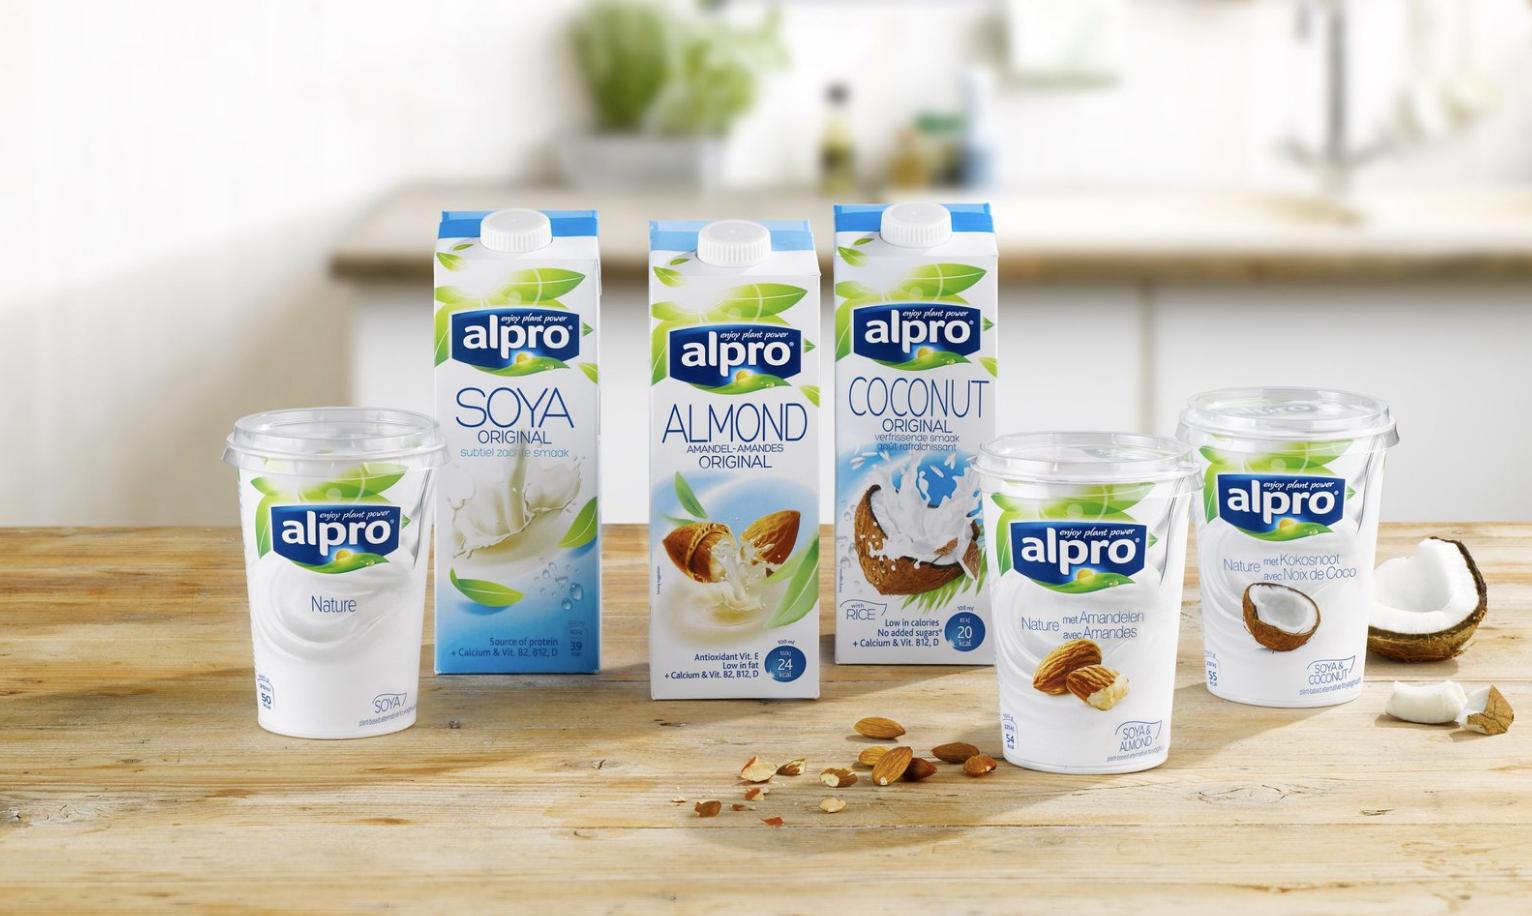 Alpro Fresh and Long life drinks + Yogurt - £1 each at Sainsbury's